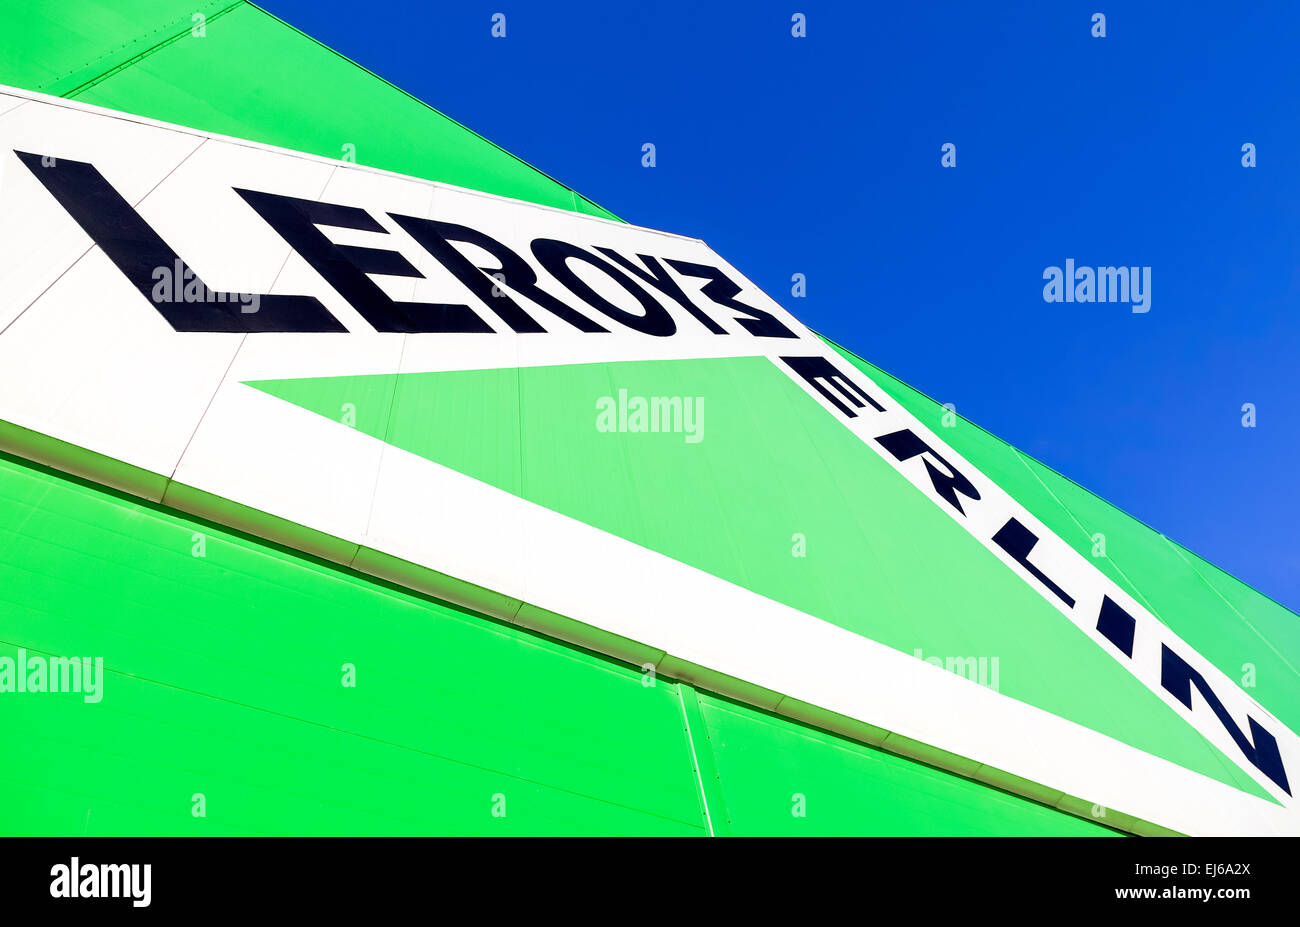 Leroy merlin brand sign against blue sky stock photo: 80044914 alamy